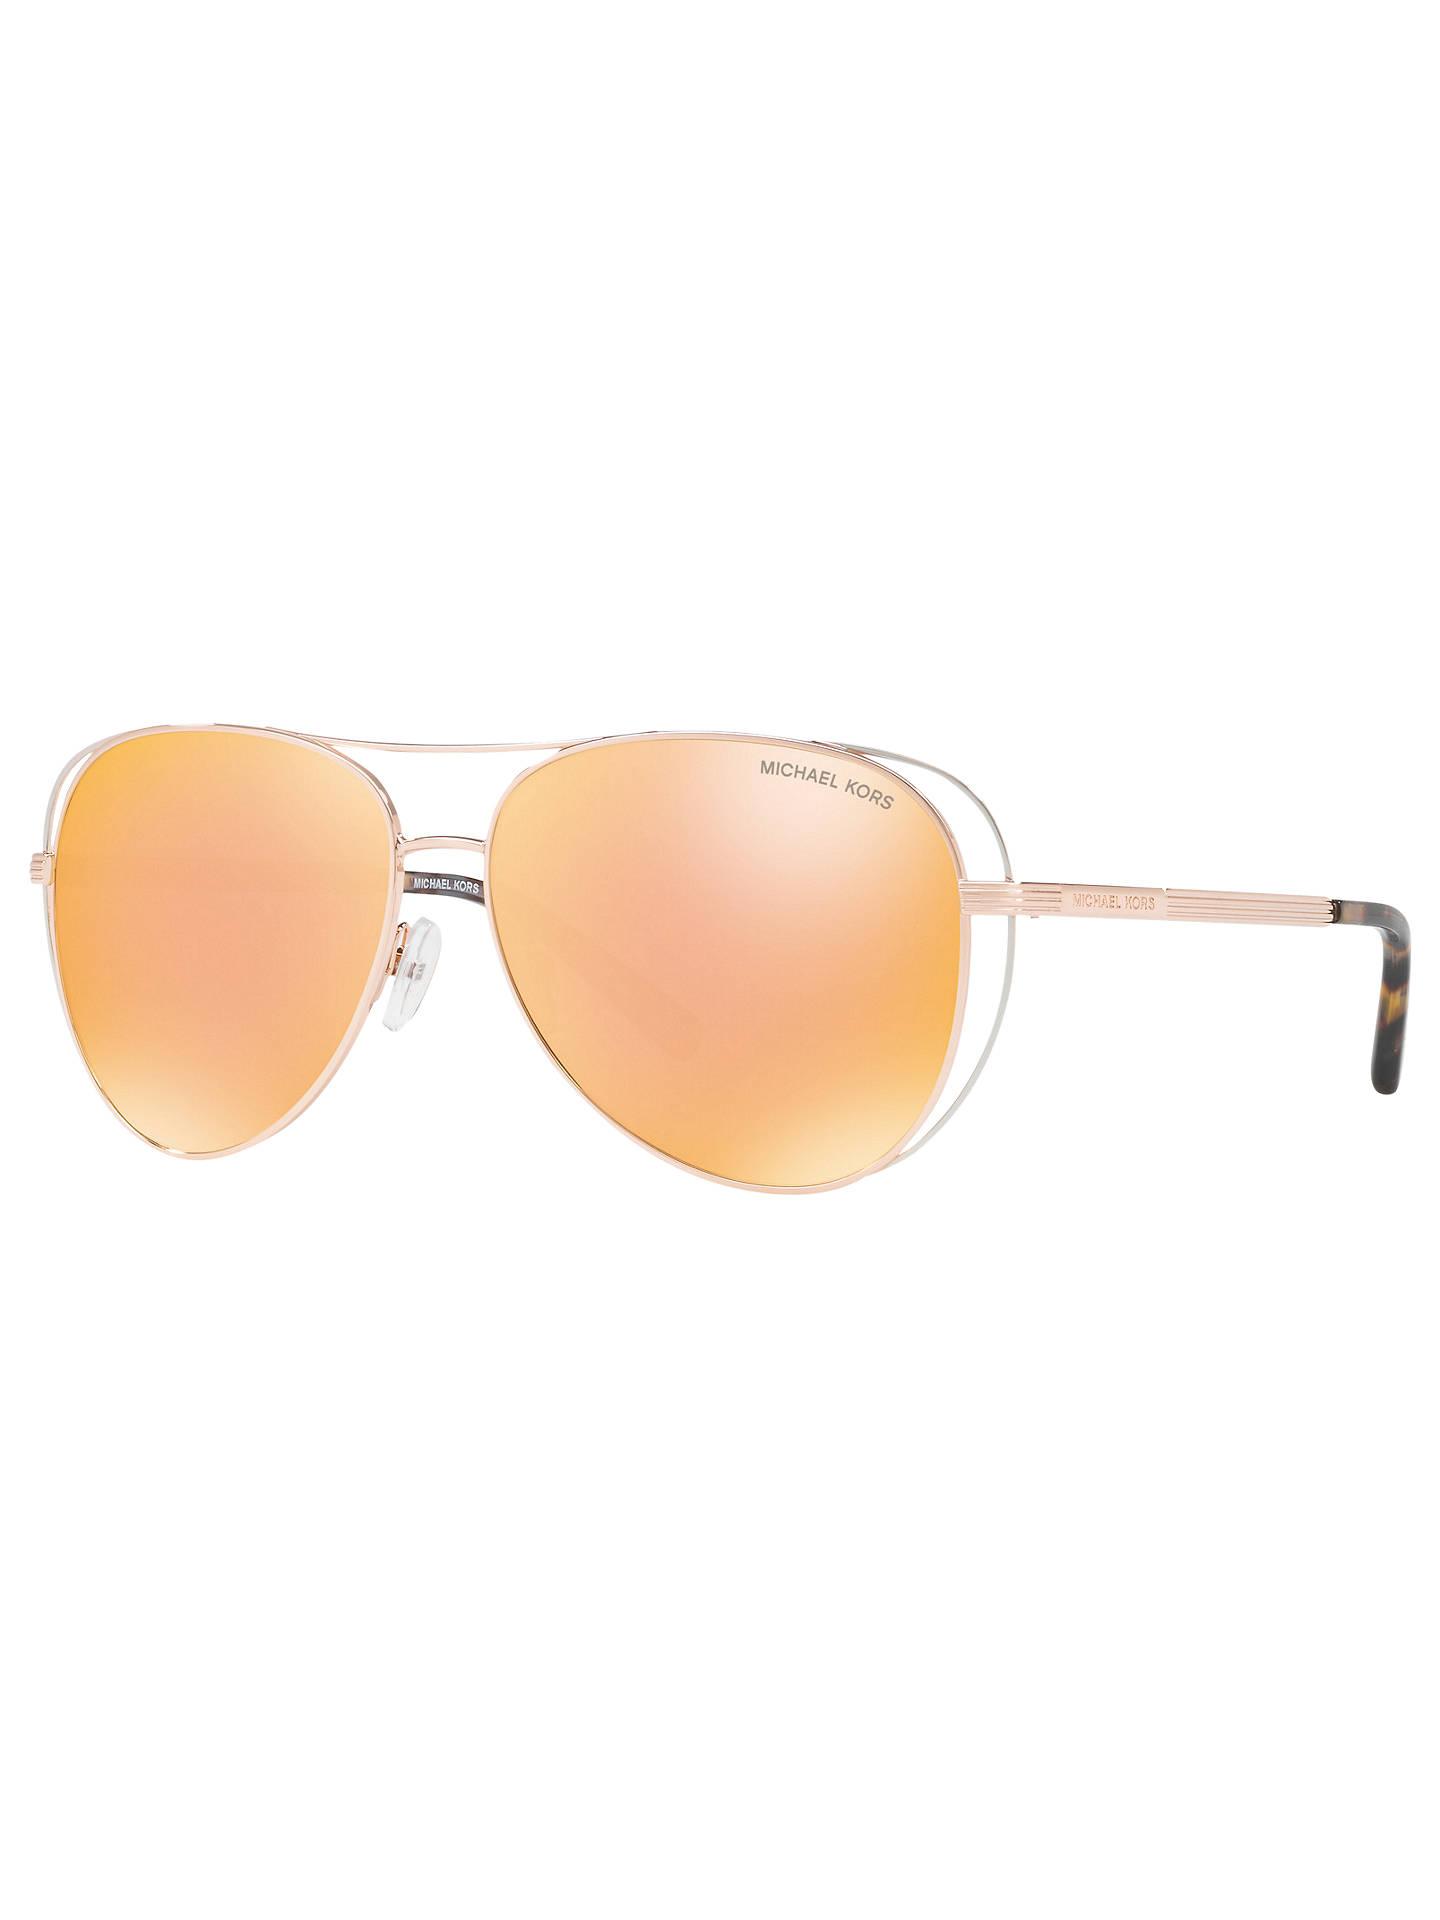 BuyMichael Kors MK1024 Lai Aviator Sunglasses e588daa8290